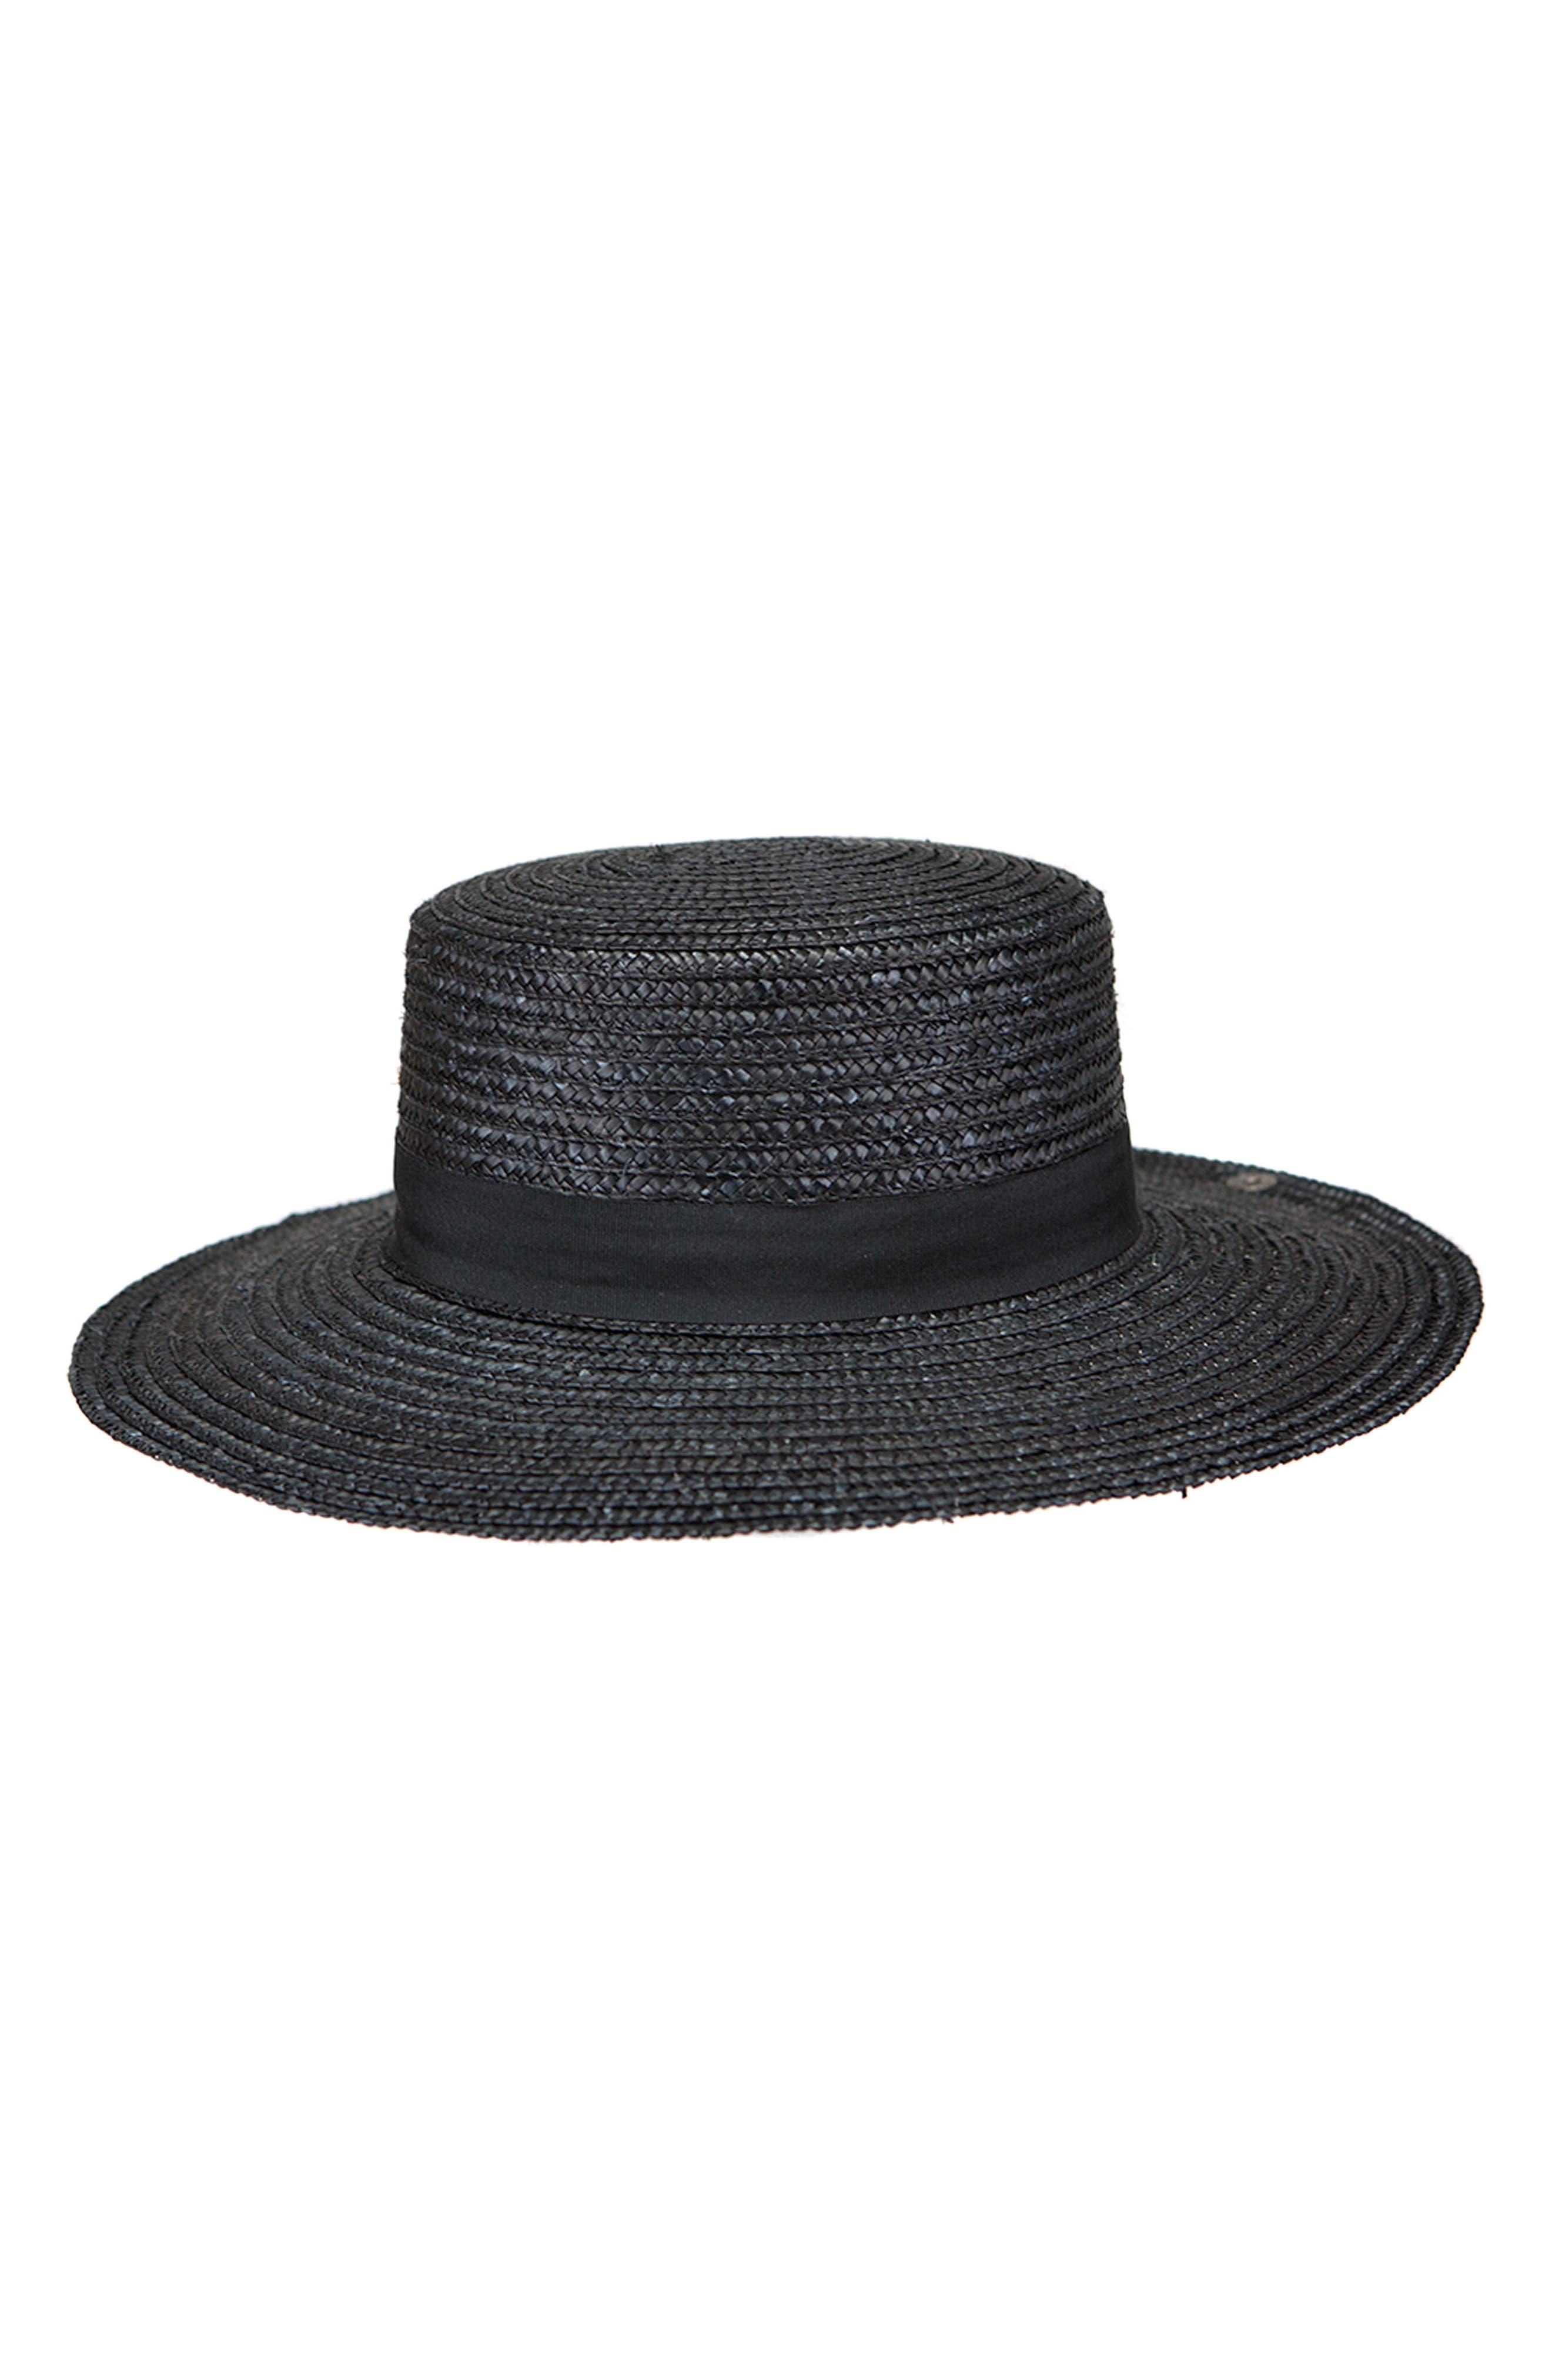 Lupe Straw Resort Hat,                             Main thumbnail 1, color,                             BLACK